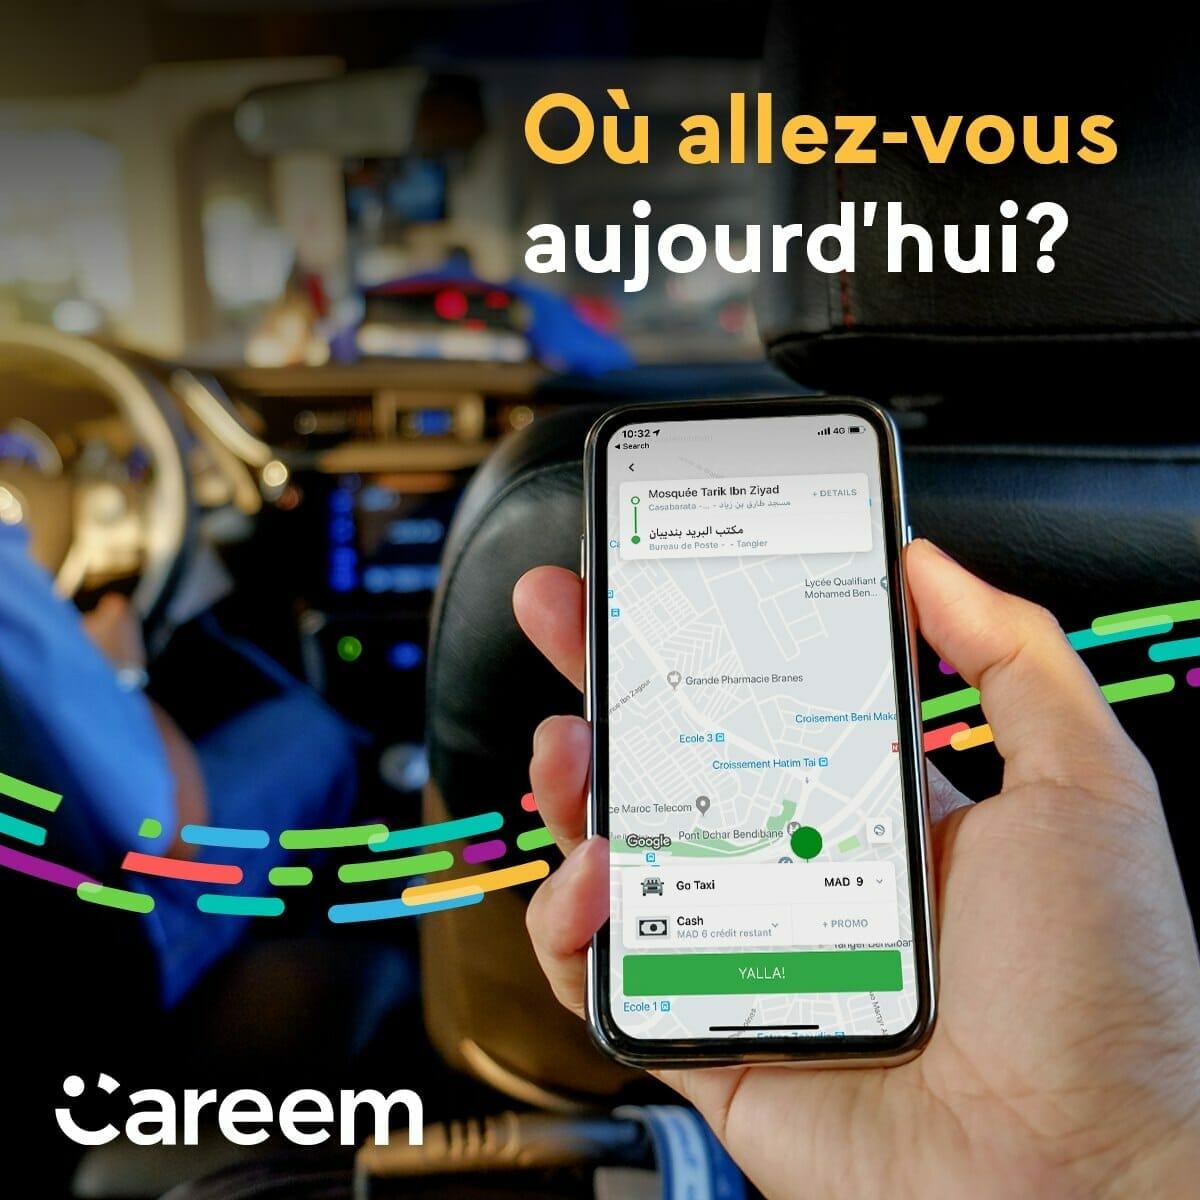 Careem-26